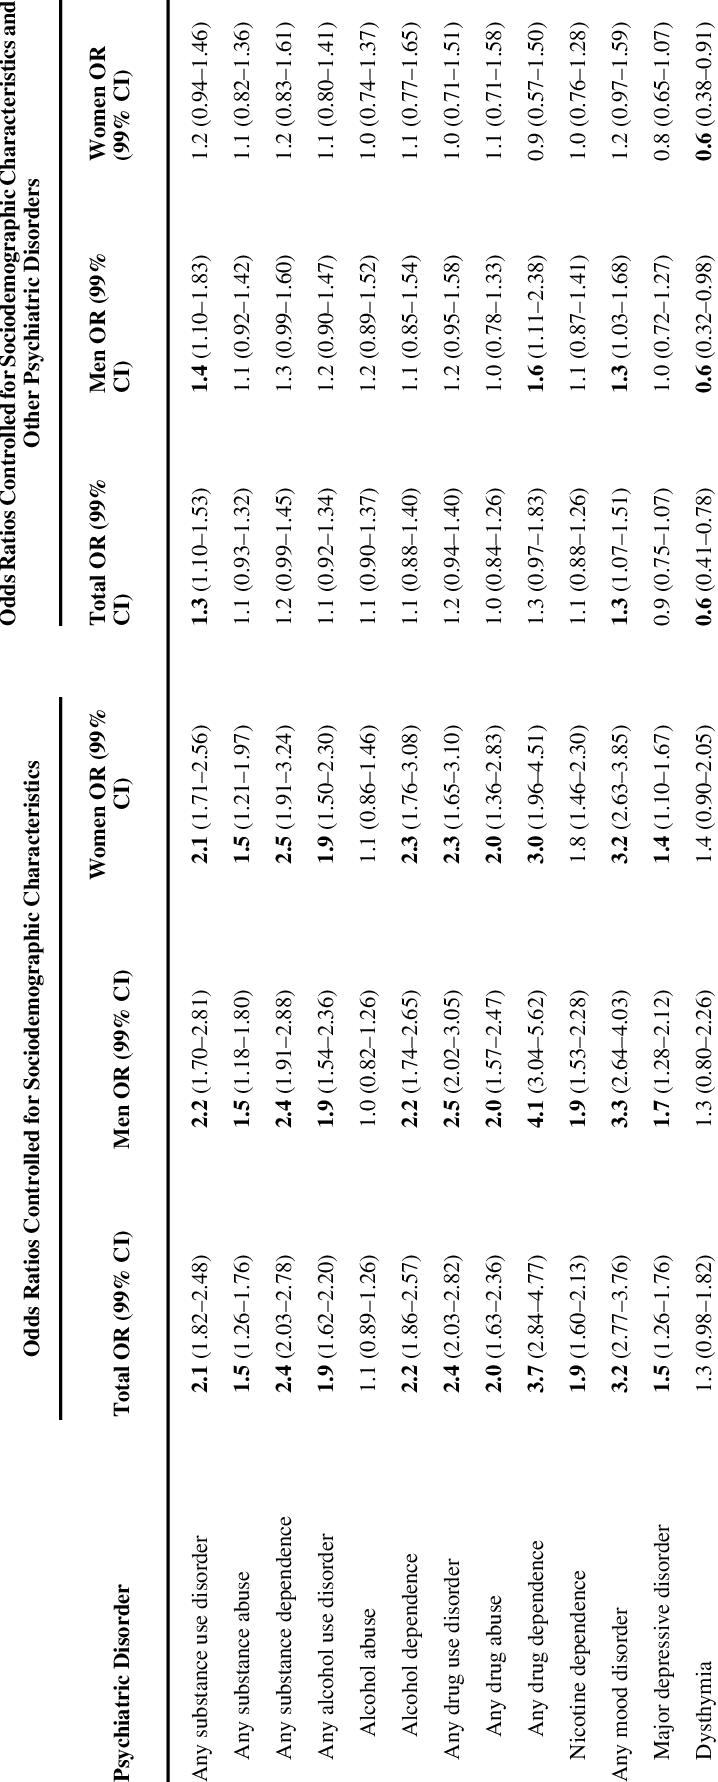 Odds Ratios (OR) of Lifetime DSM-IV Narcissistic